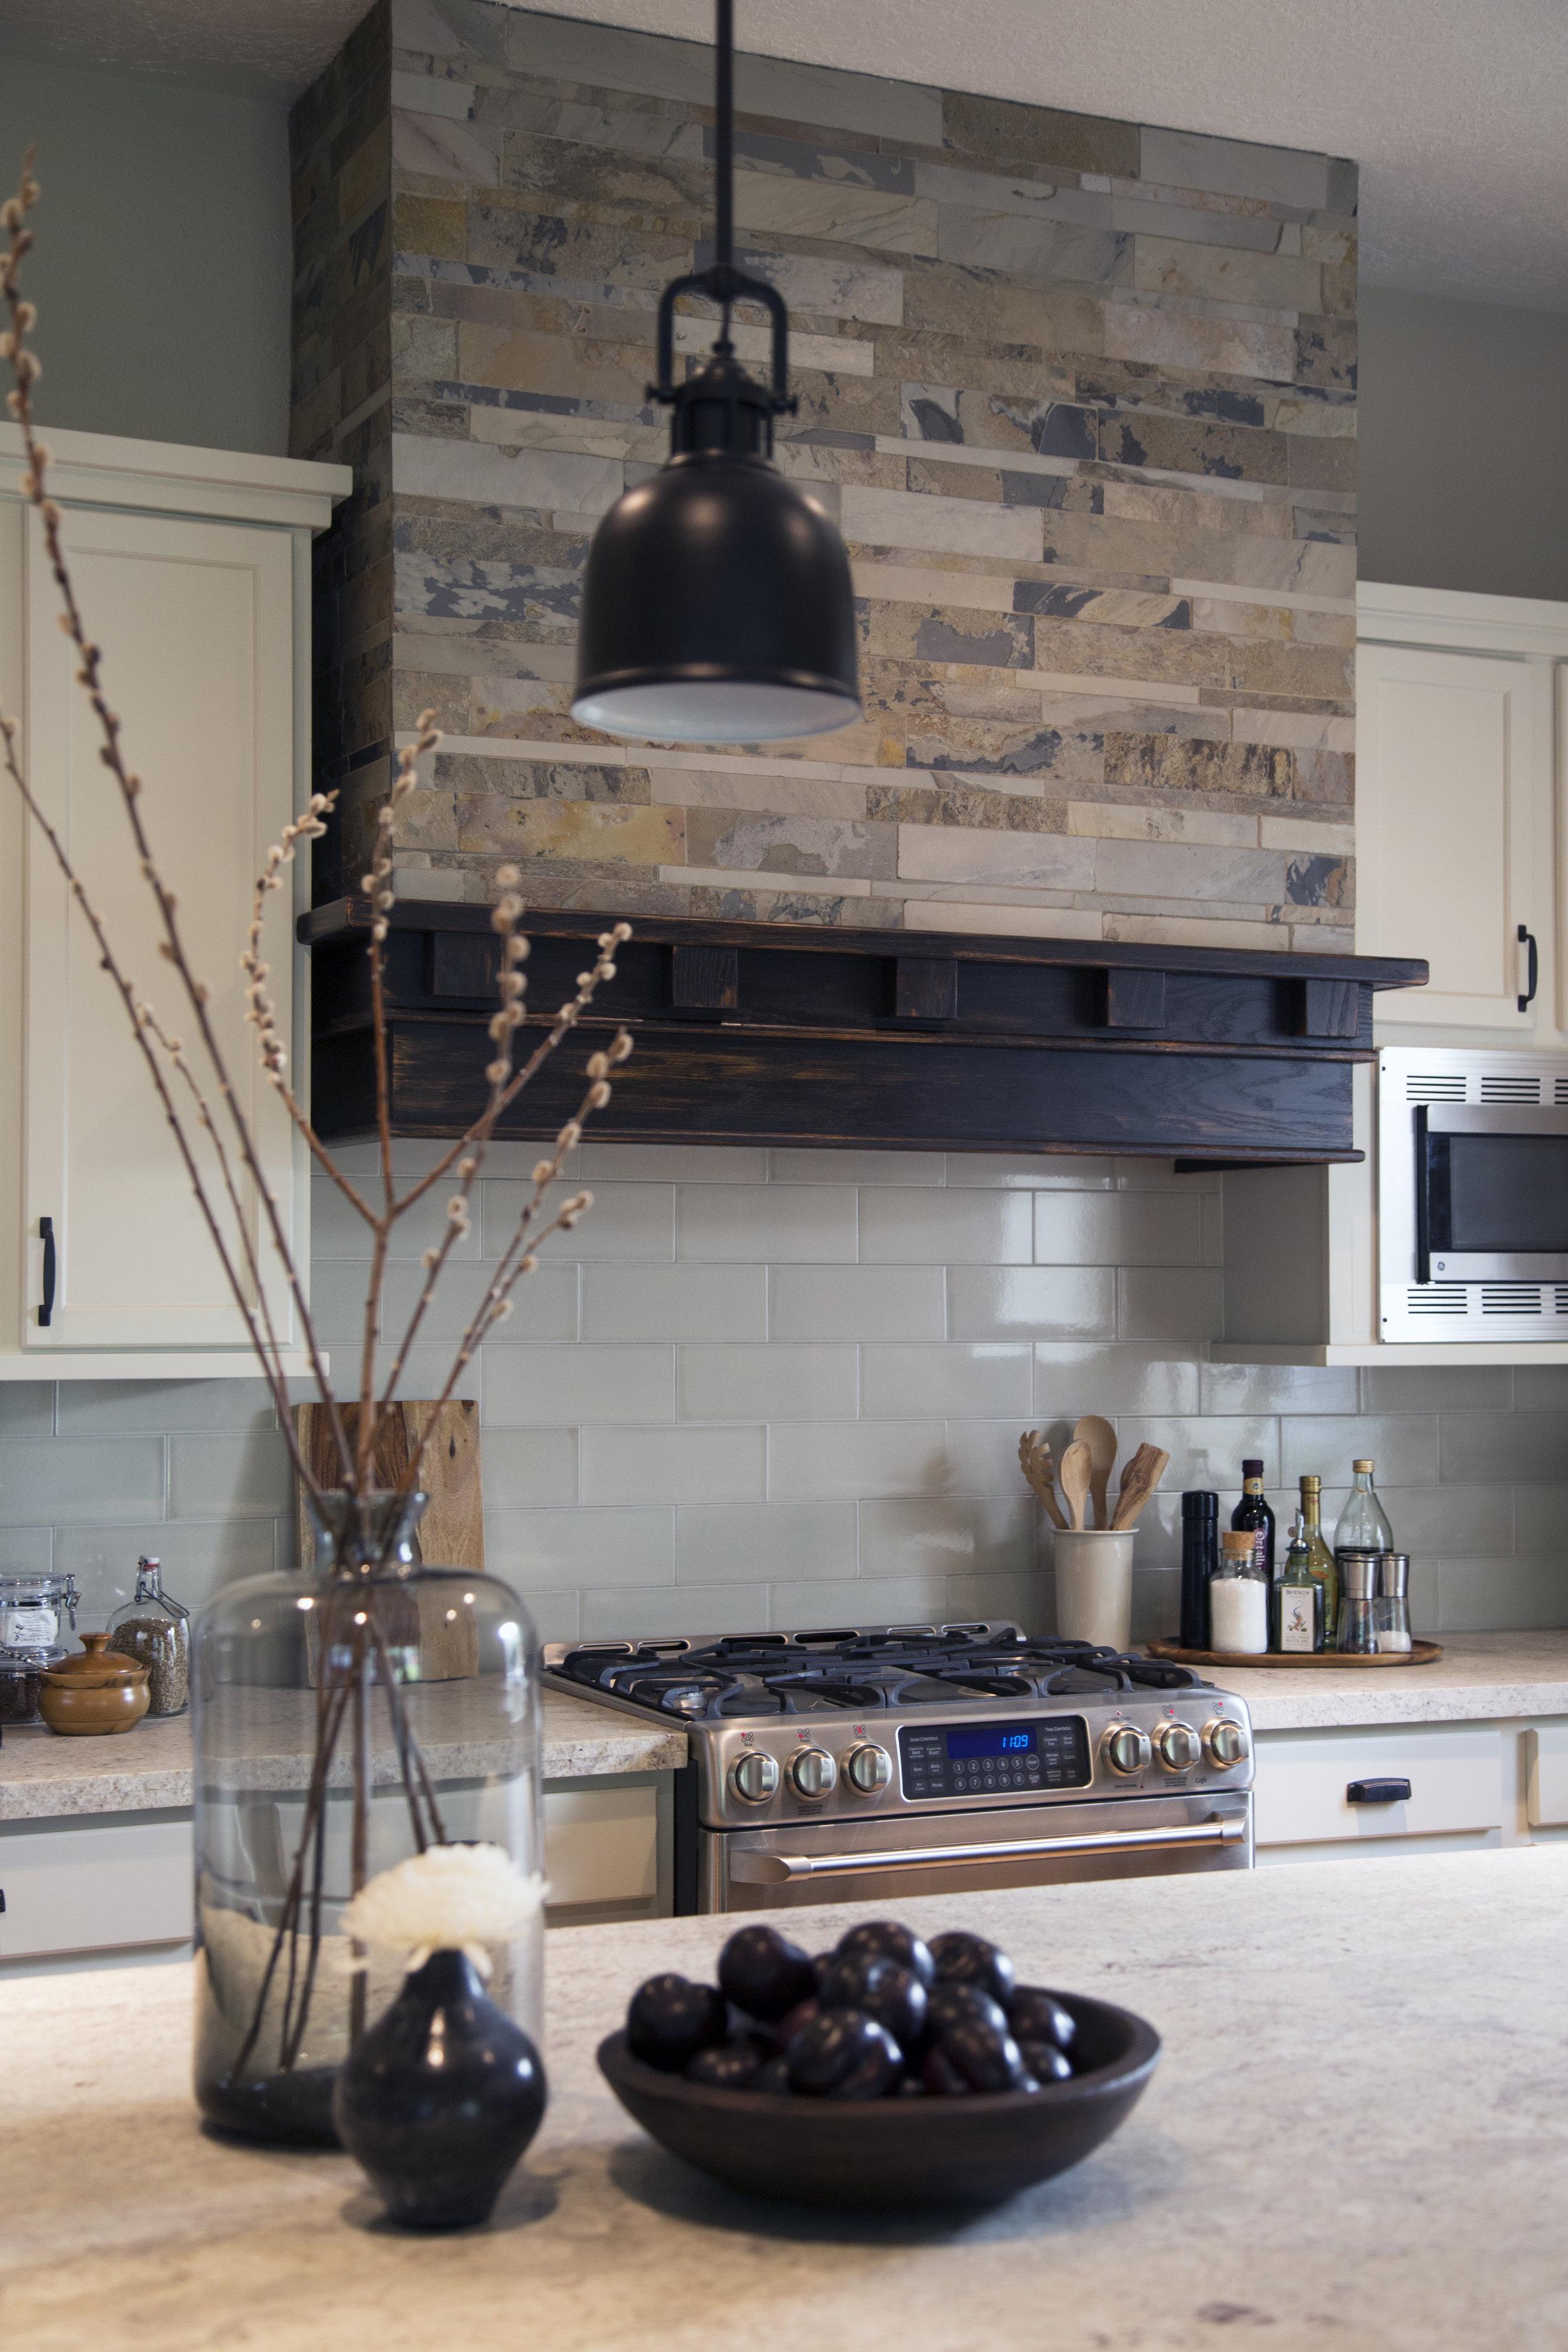 Kashmire White Granite in honed finish, Kitchen Remodel - Designer: Carla Aston, Photographer: Tori Aston